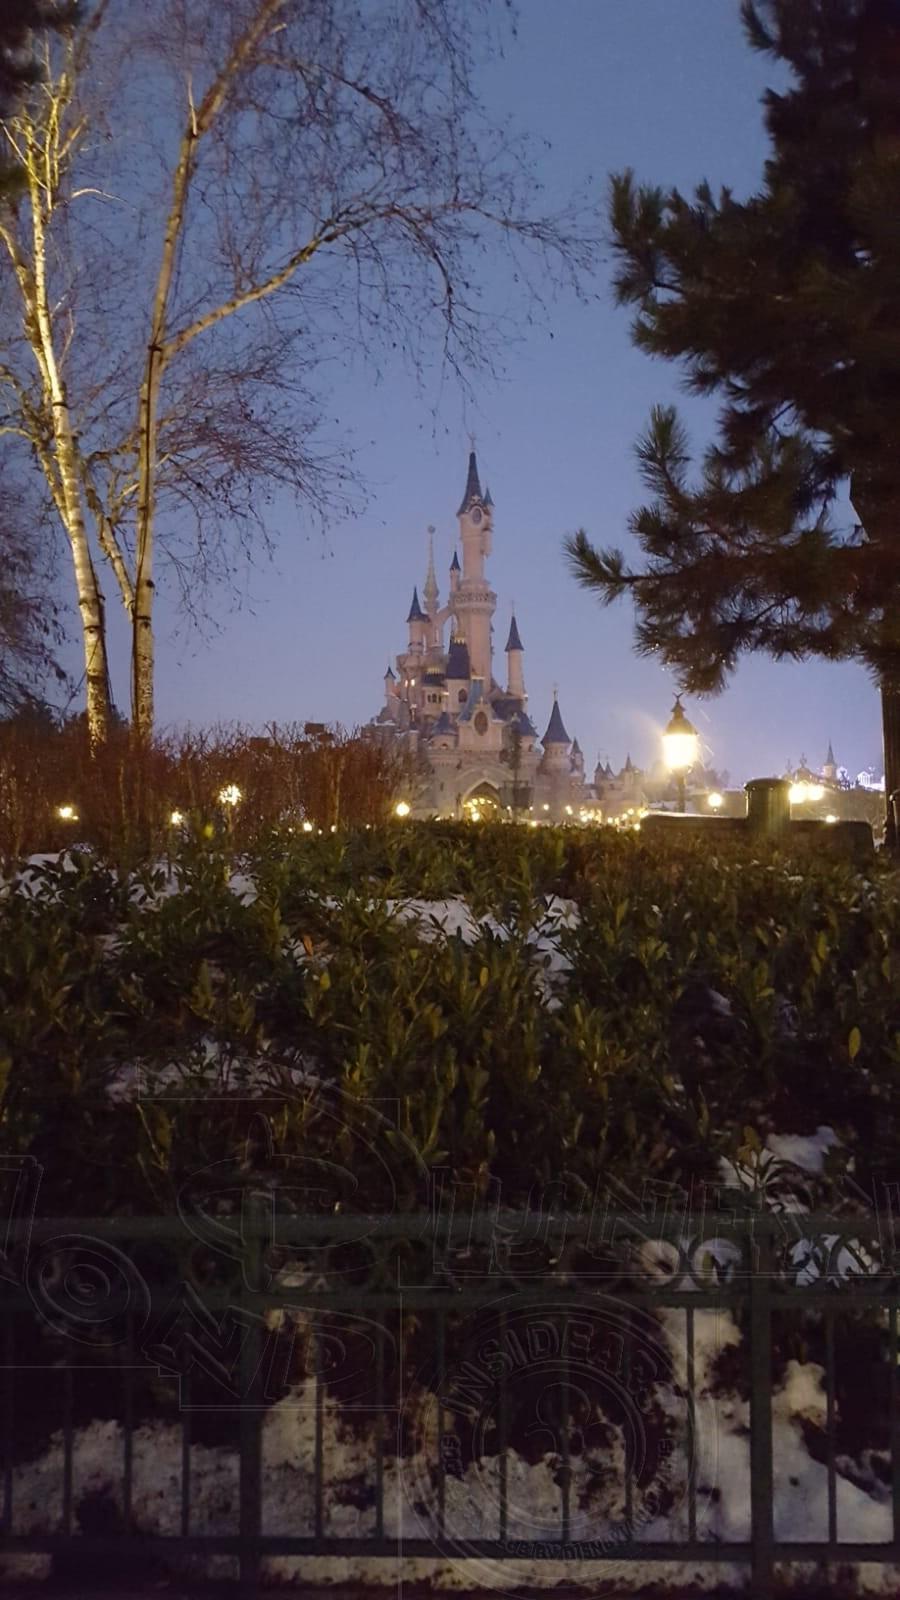 2018 - Disneyland Paris sotto la neve - Pagina 4 01neve21